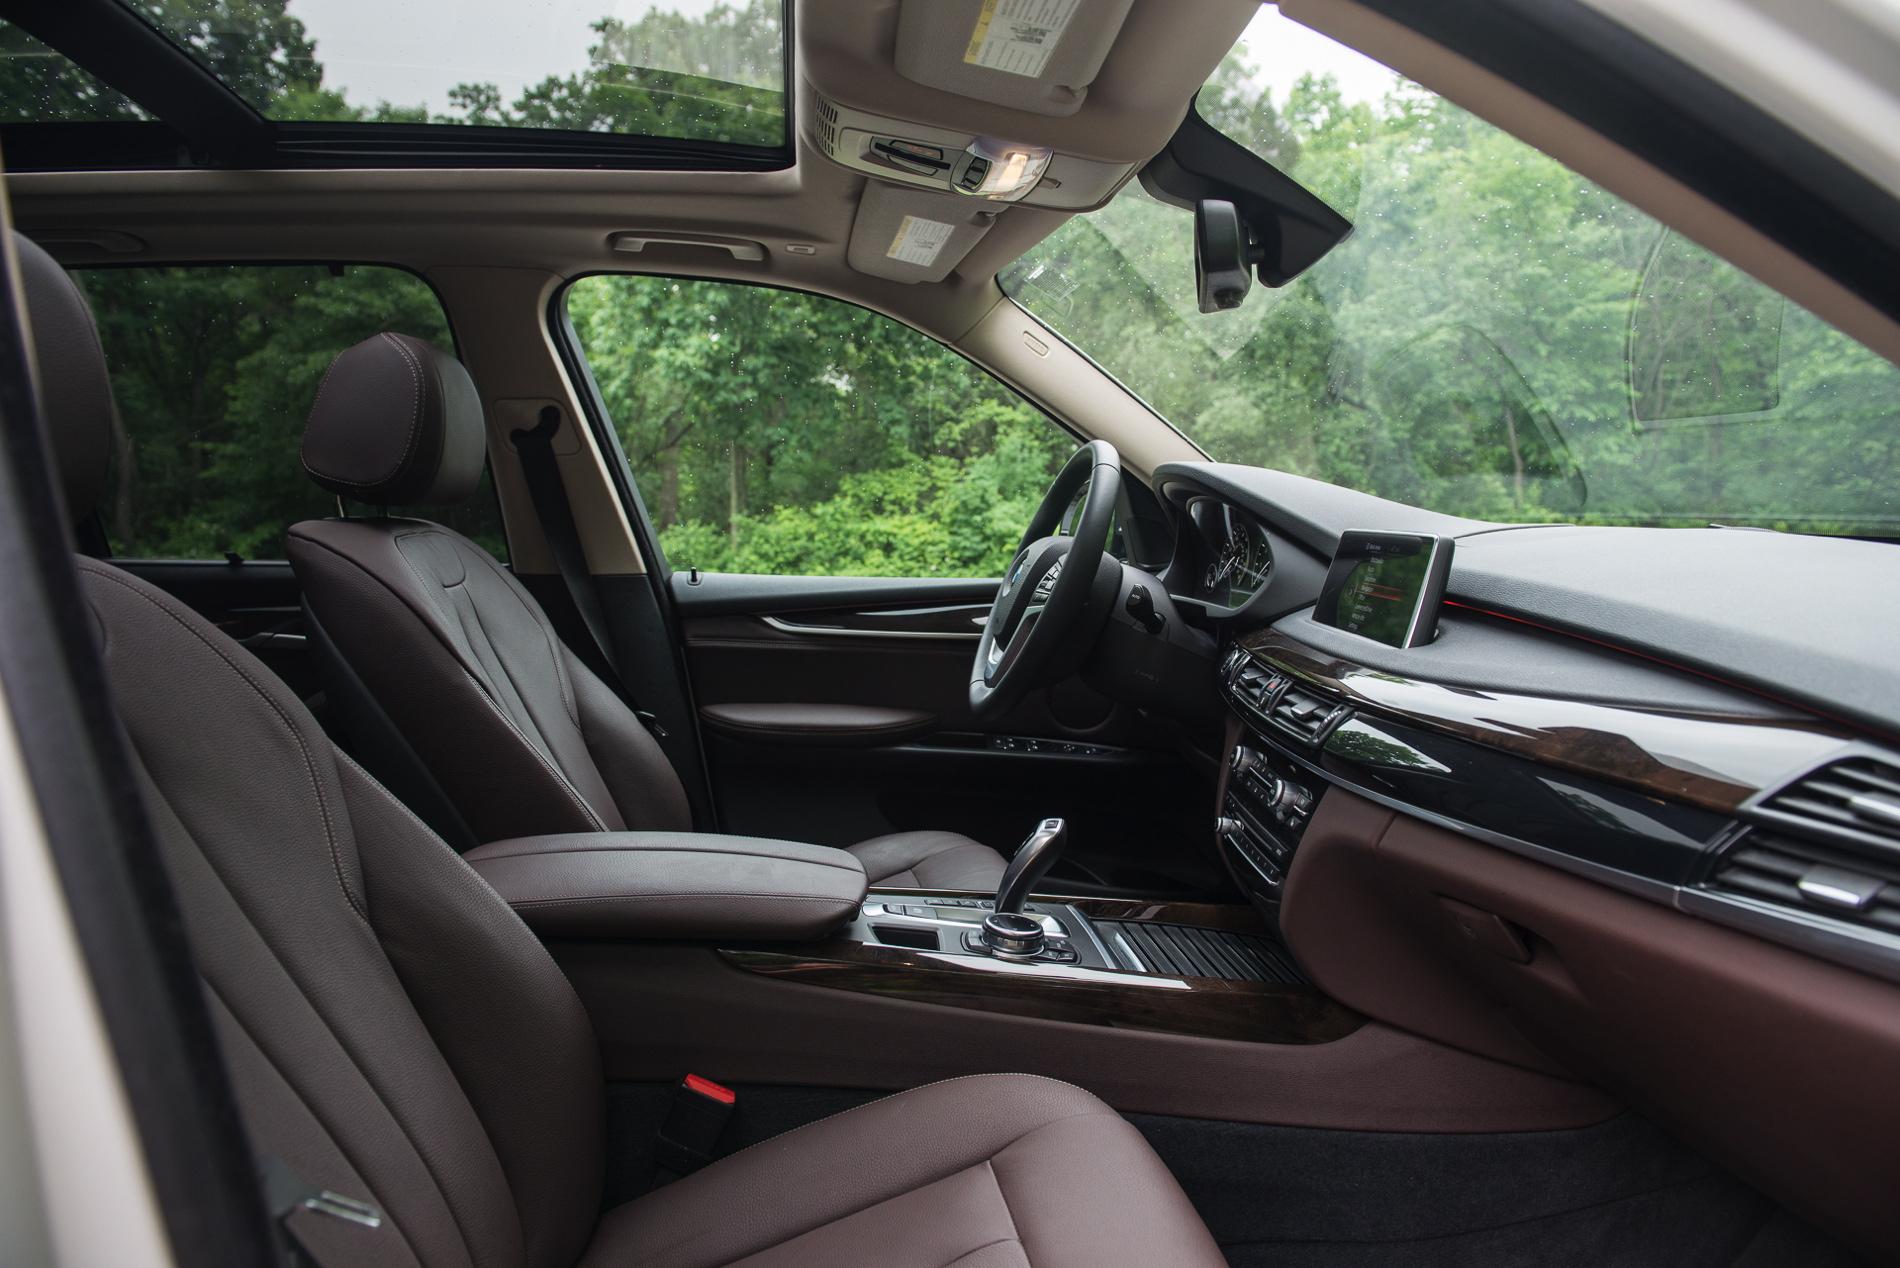 2017 Bmw X5 Xdrive35i Test Drive 33